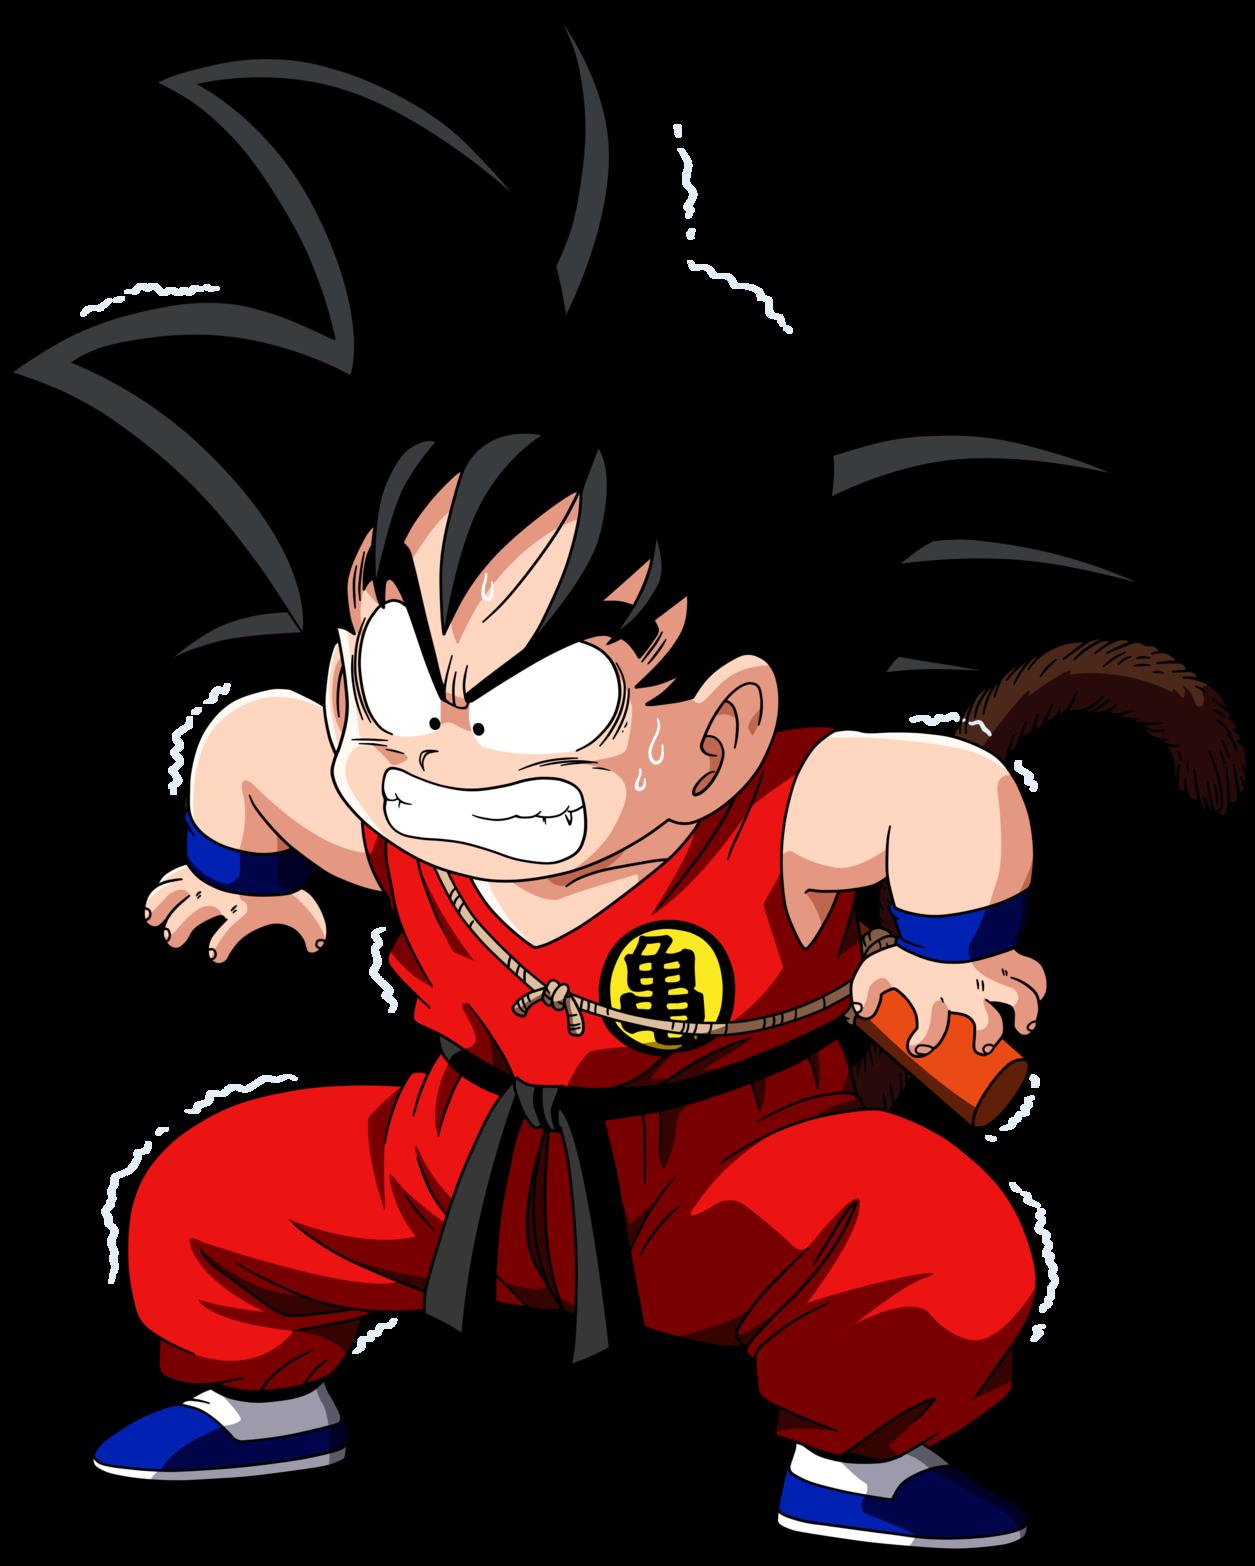 Clipart for u: Dragon Ball Z.